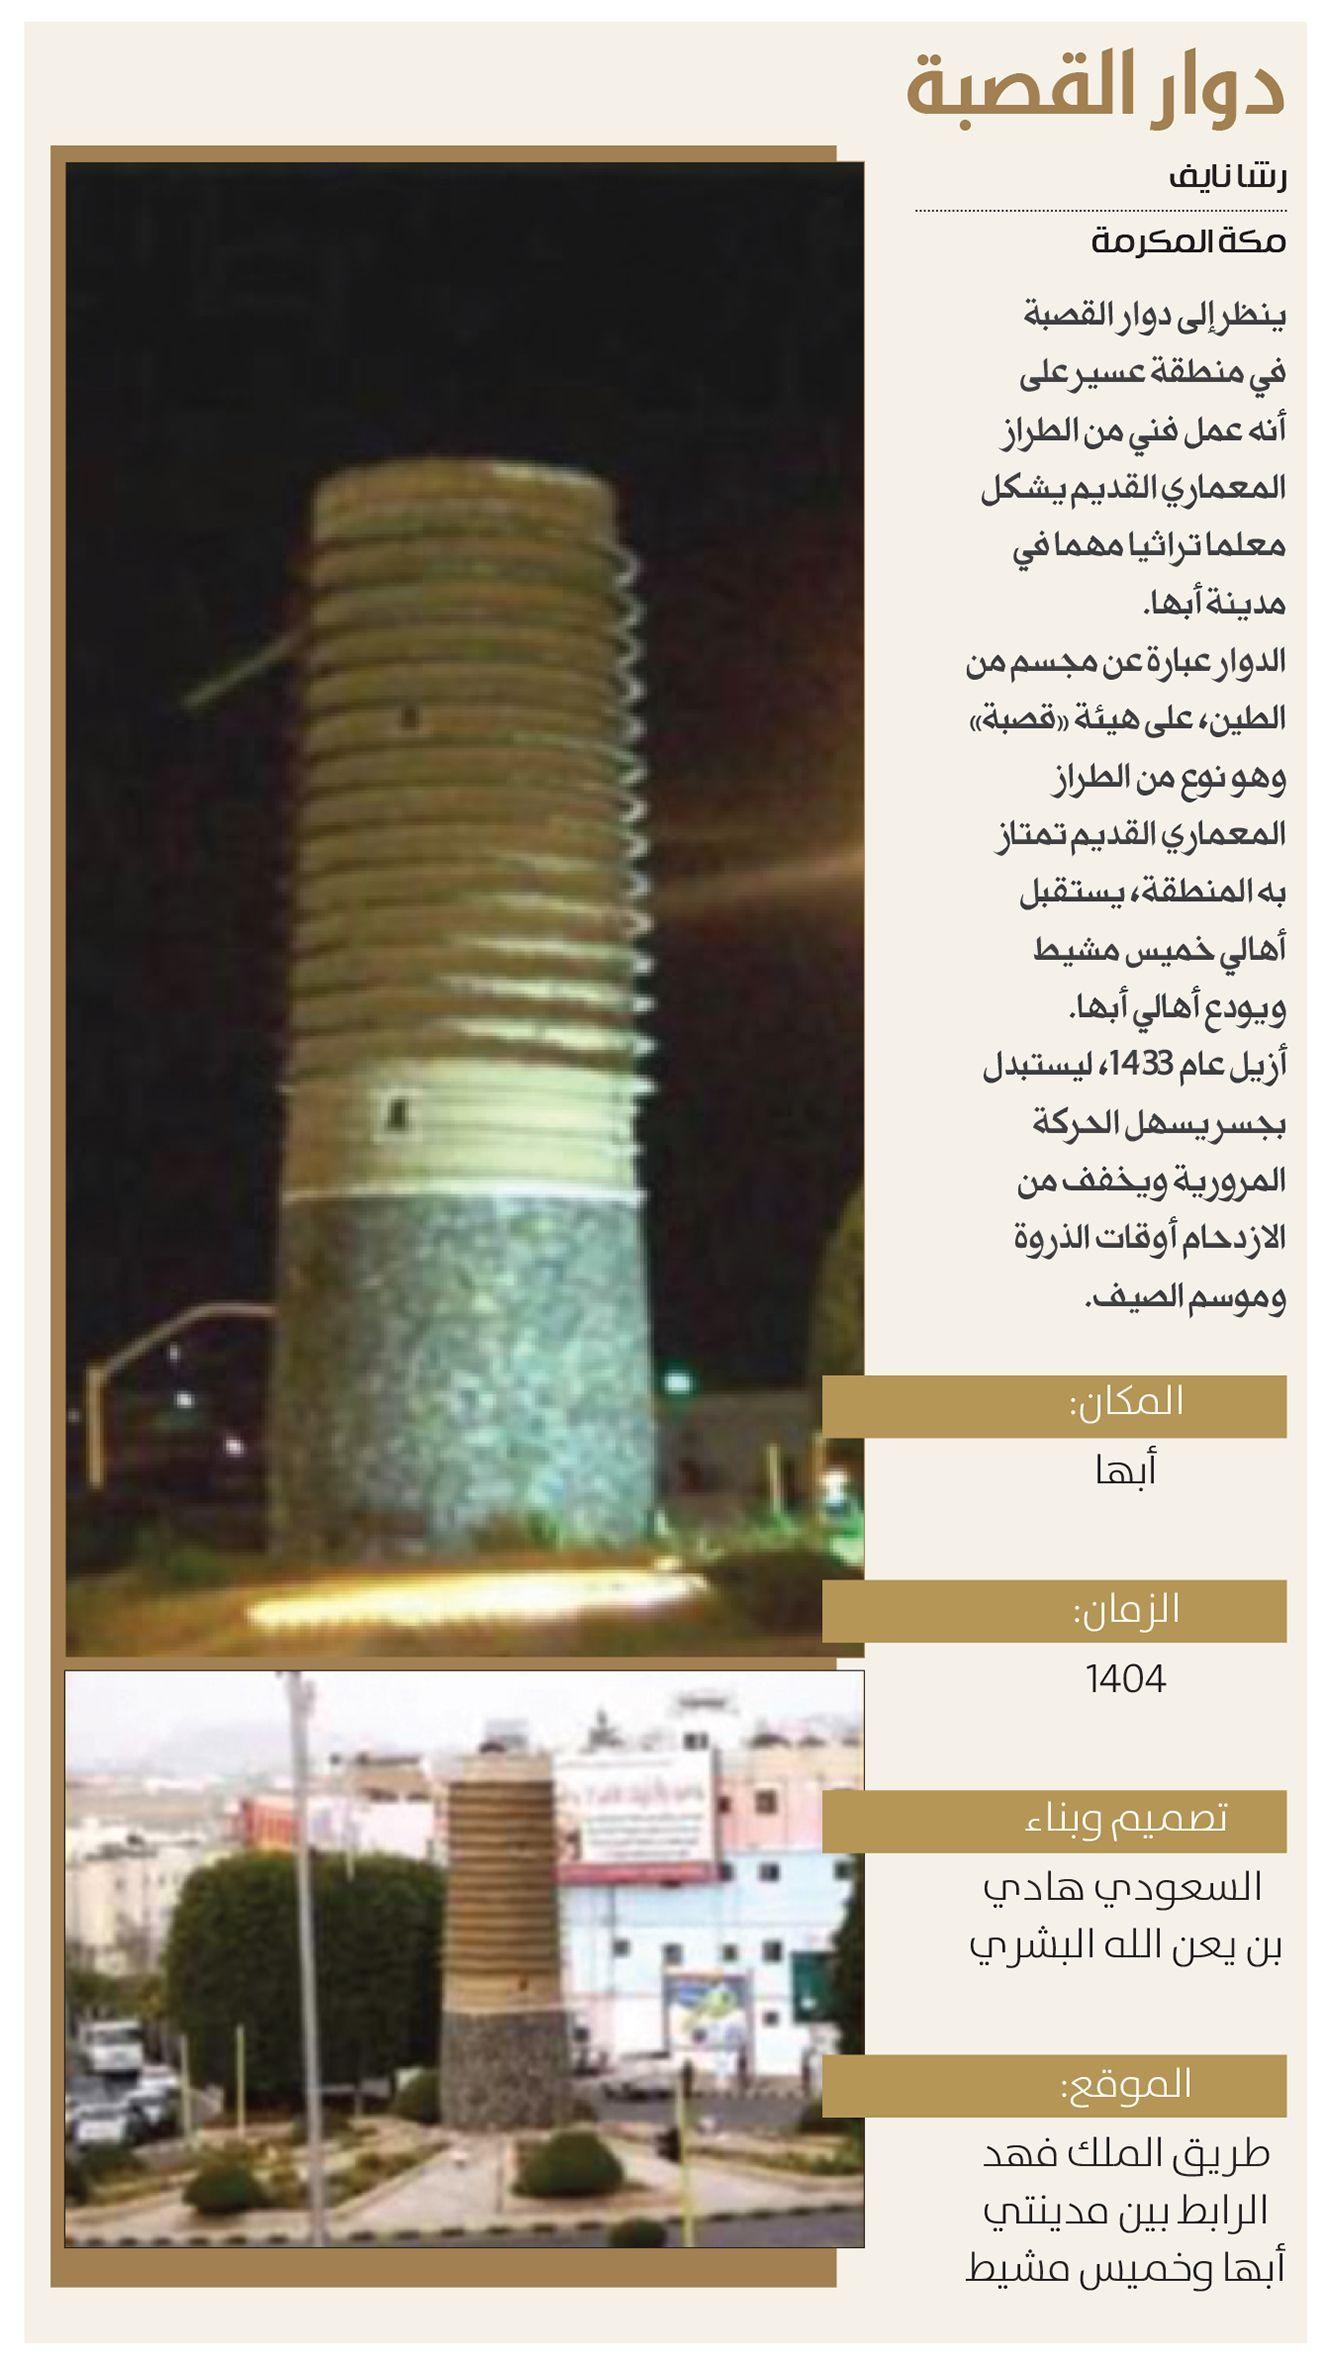 شارع الفن أبها Pictures Photo Saudi Arabia